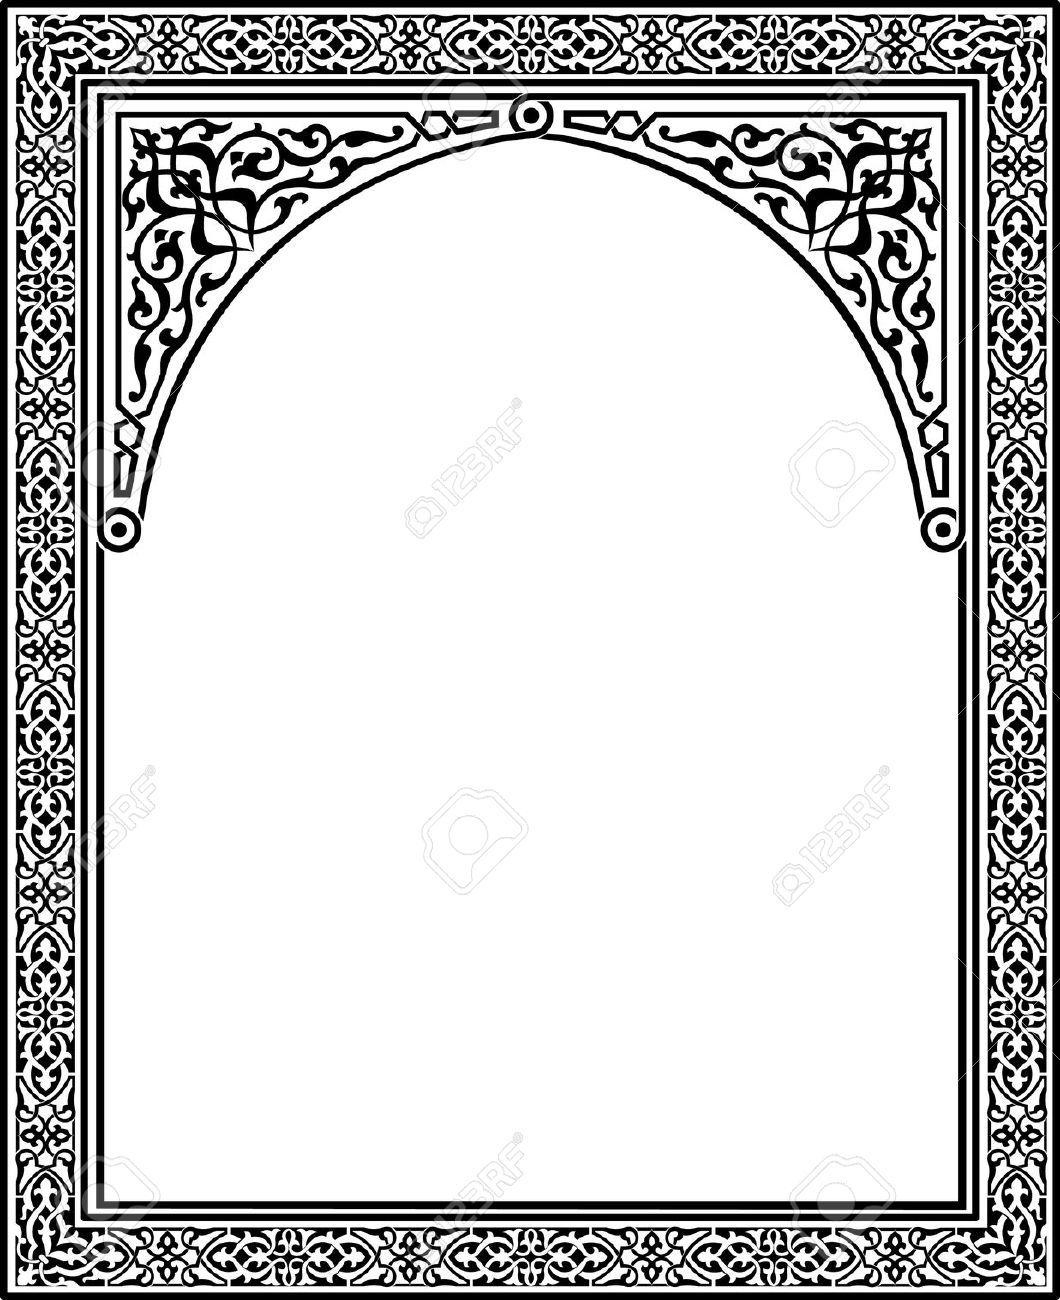 Islamic Arabesque style, border frame with flourish ornament ...